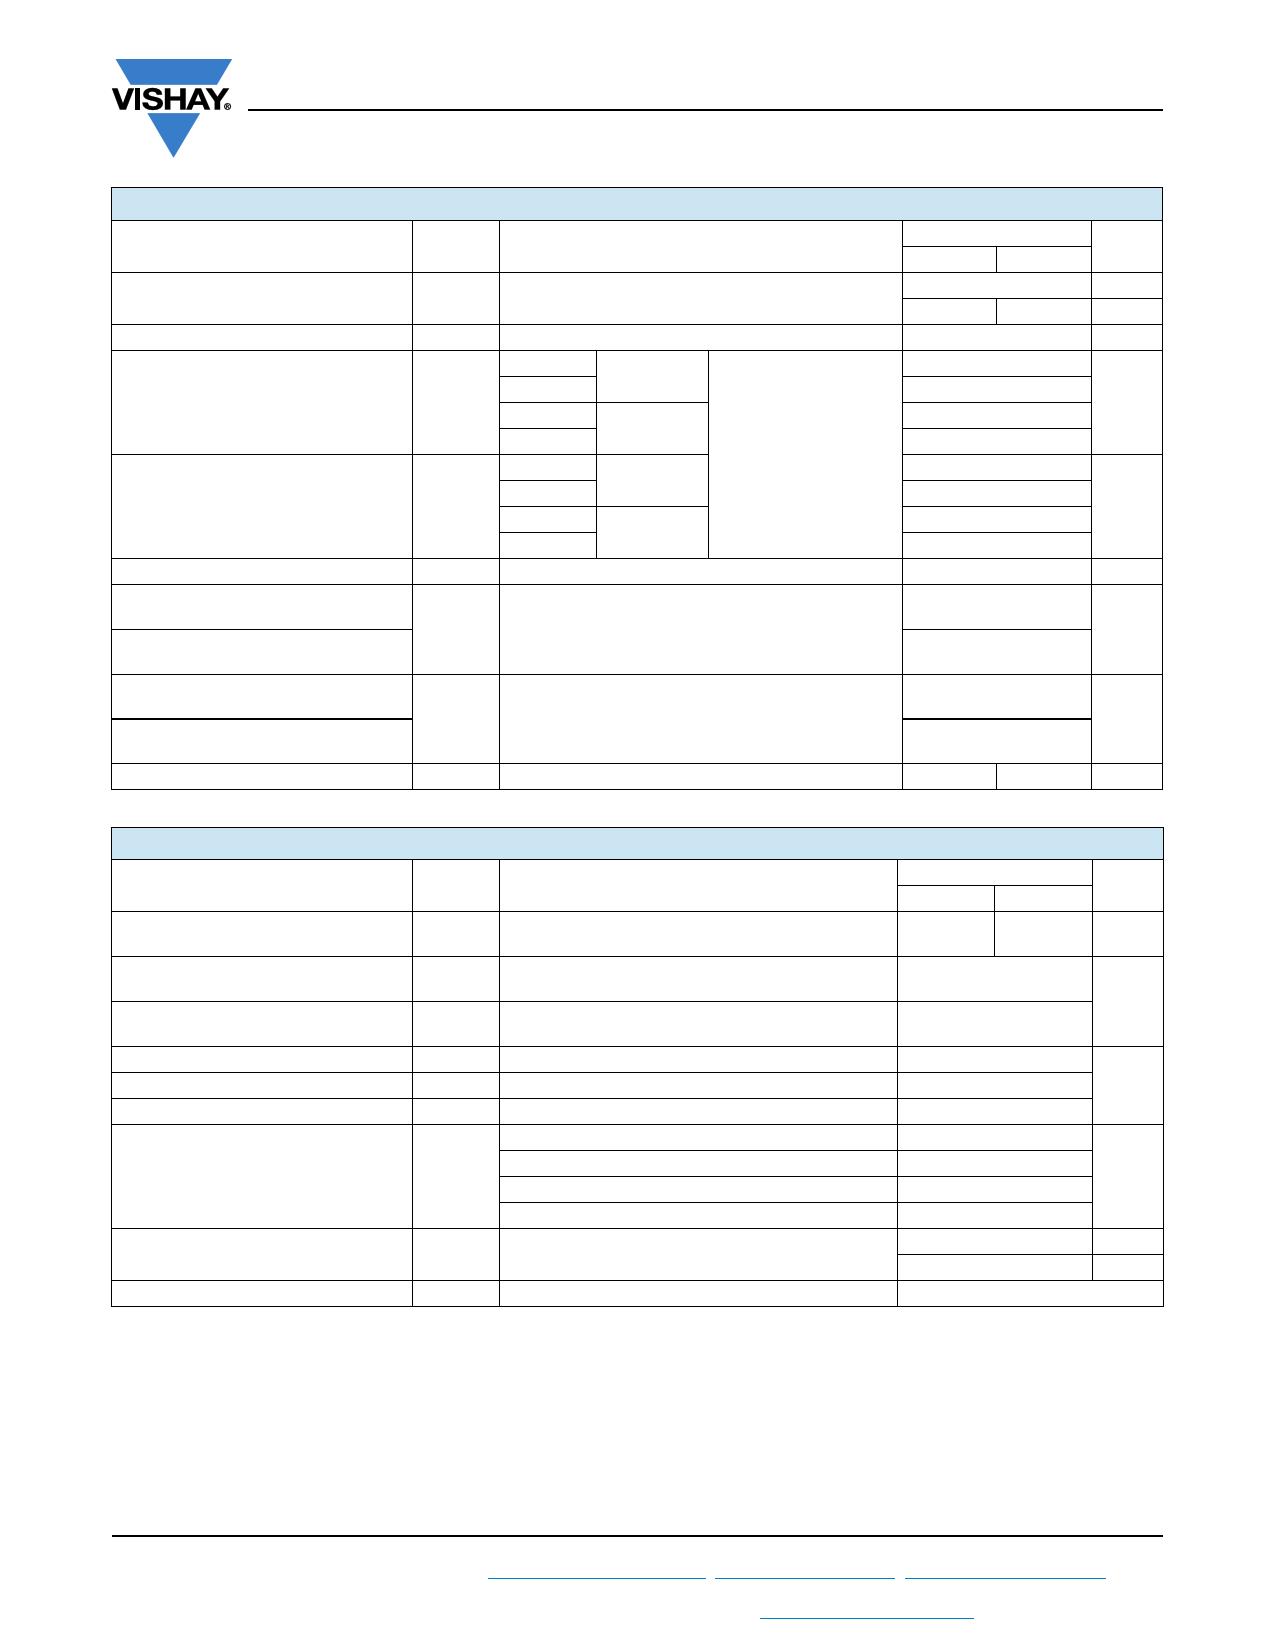 VS-88HF120 pdf, equivalent, schematic